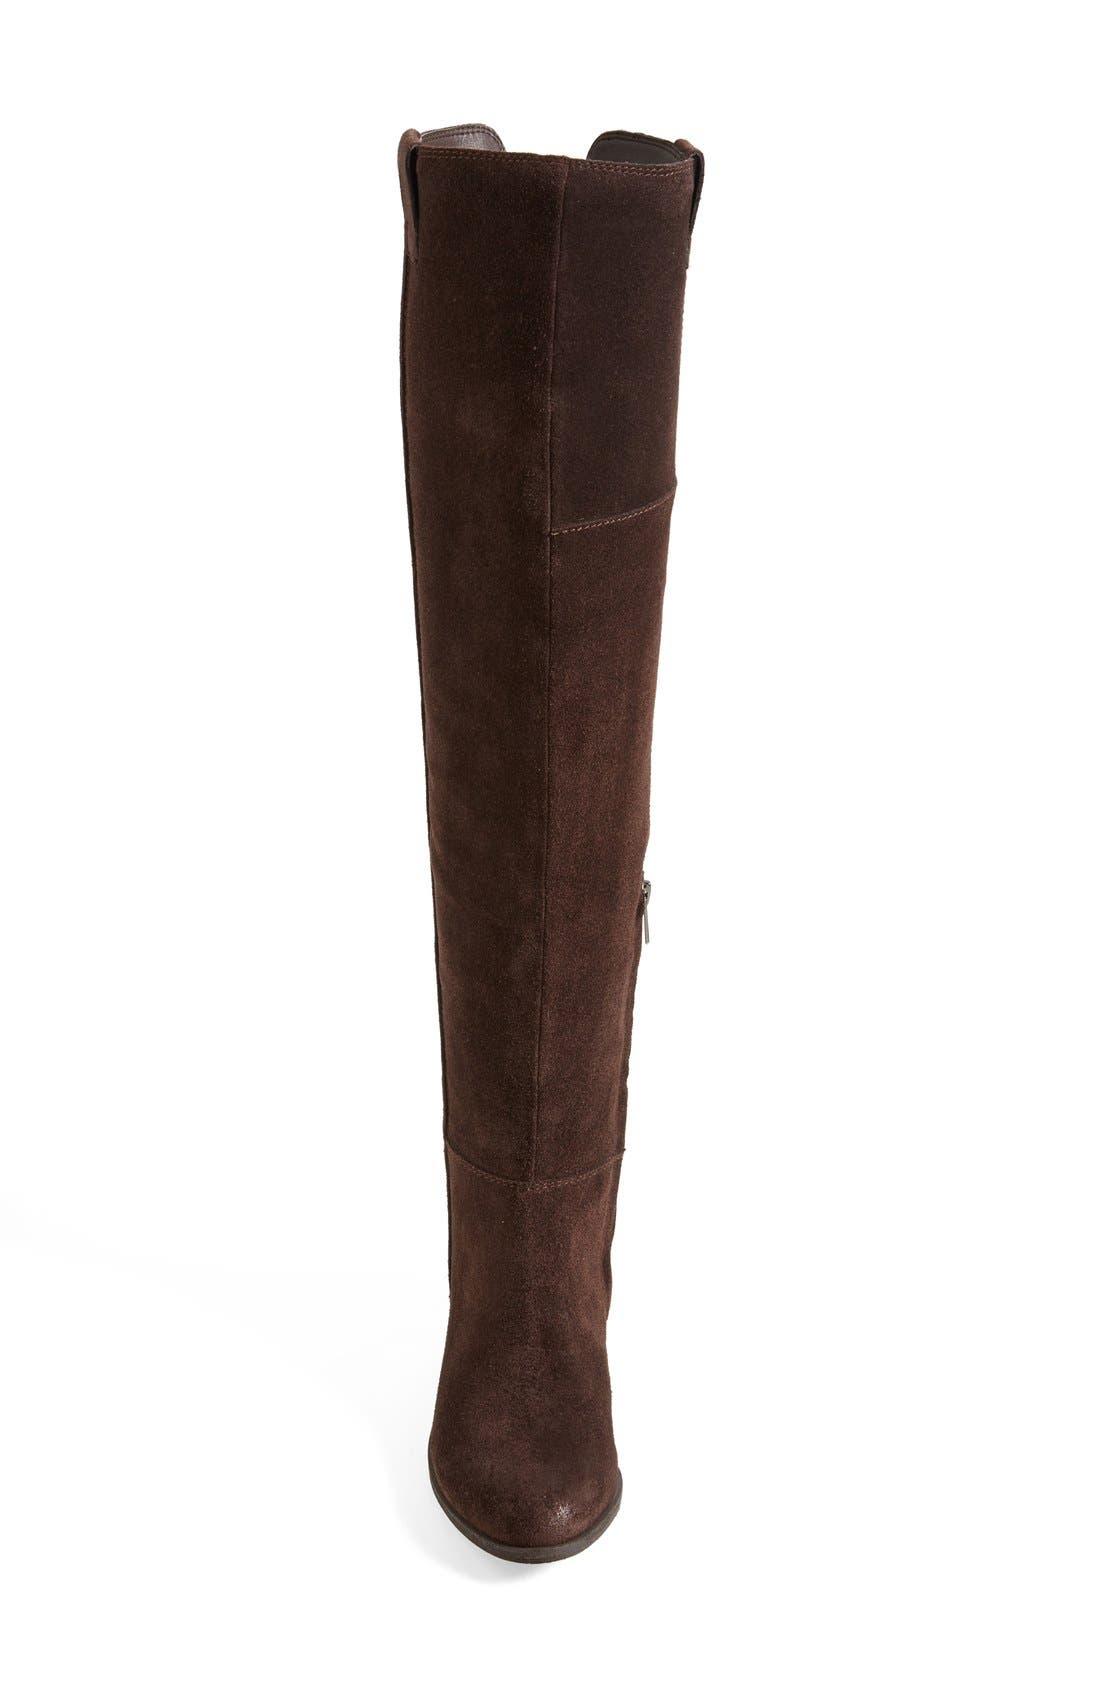 Alternate Image 3  - Sam Edelman 'Johanna' Over the Knee Suede Boot (Women)